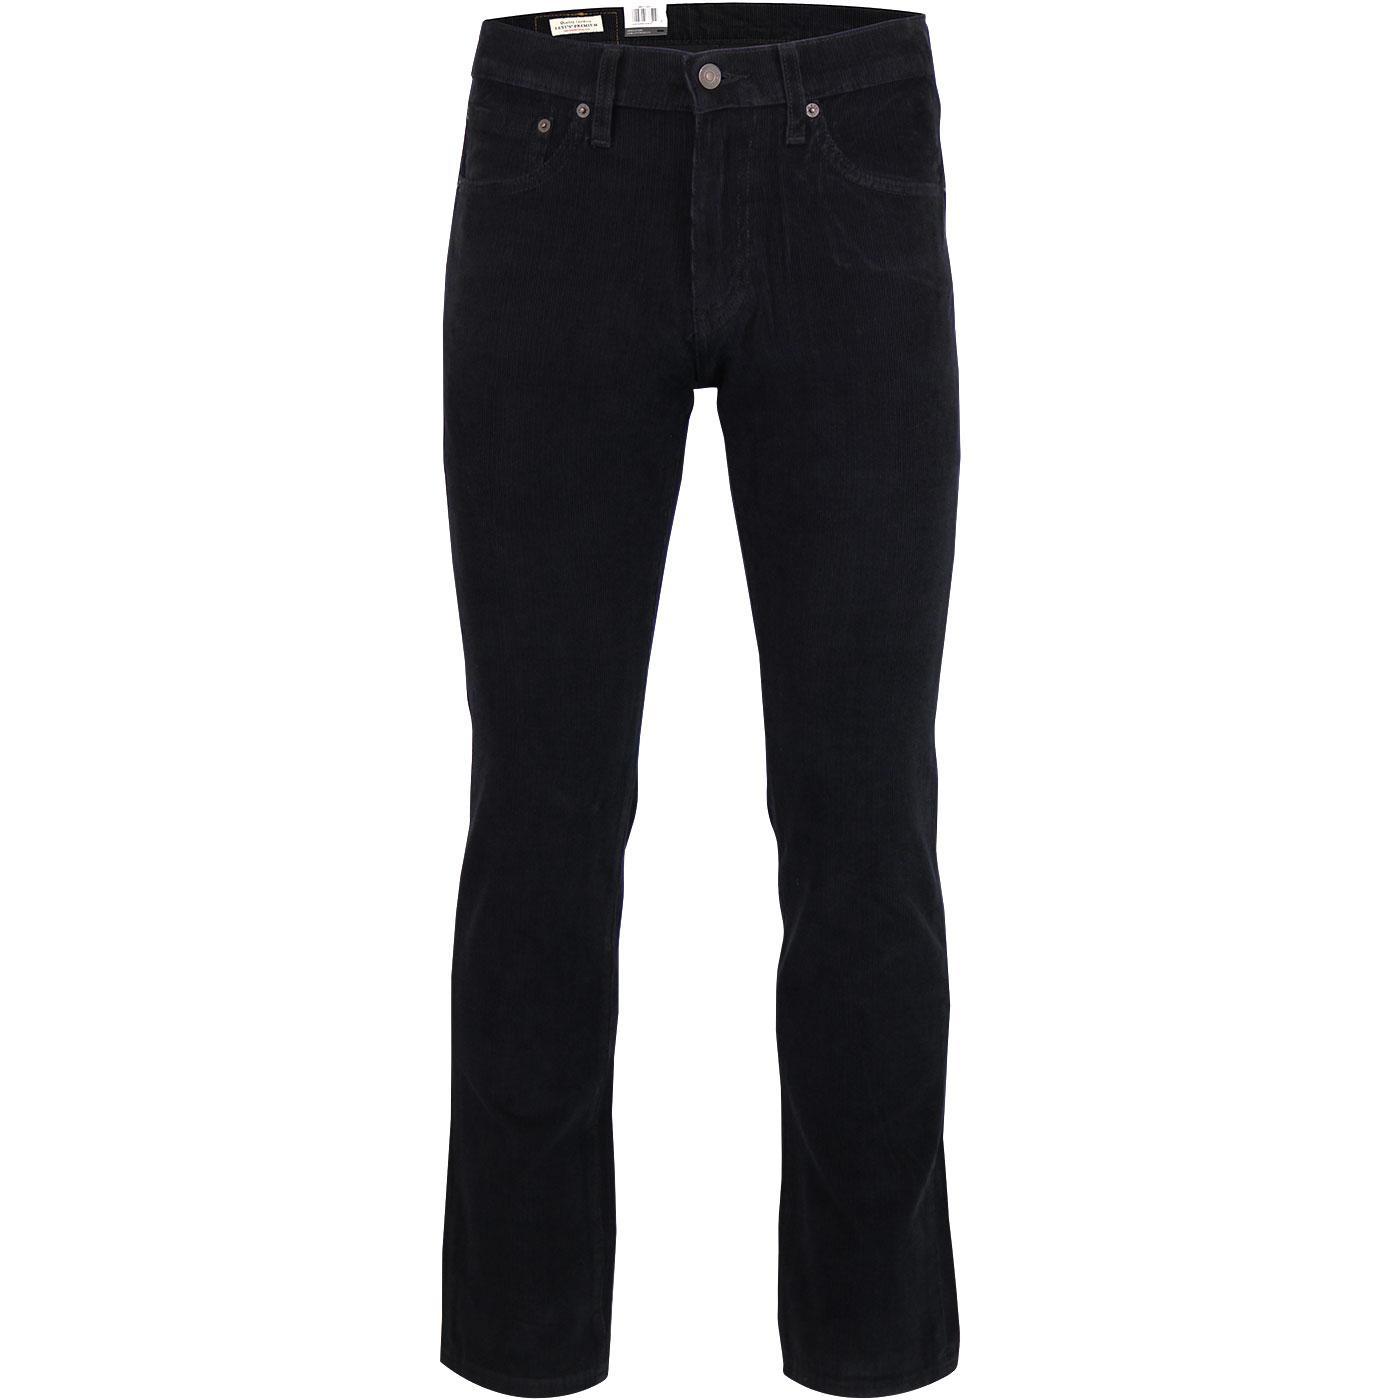 LEVI'S 511 Retro Men's Mod Slim Cord Jeans (Black)